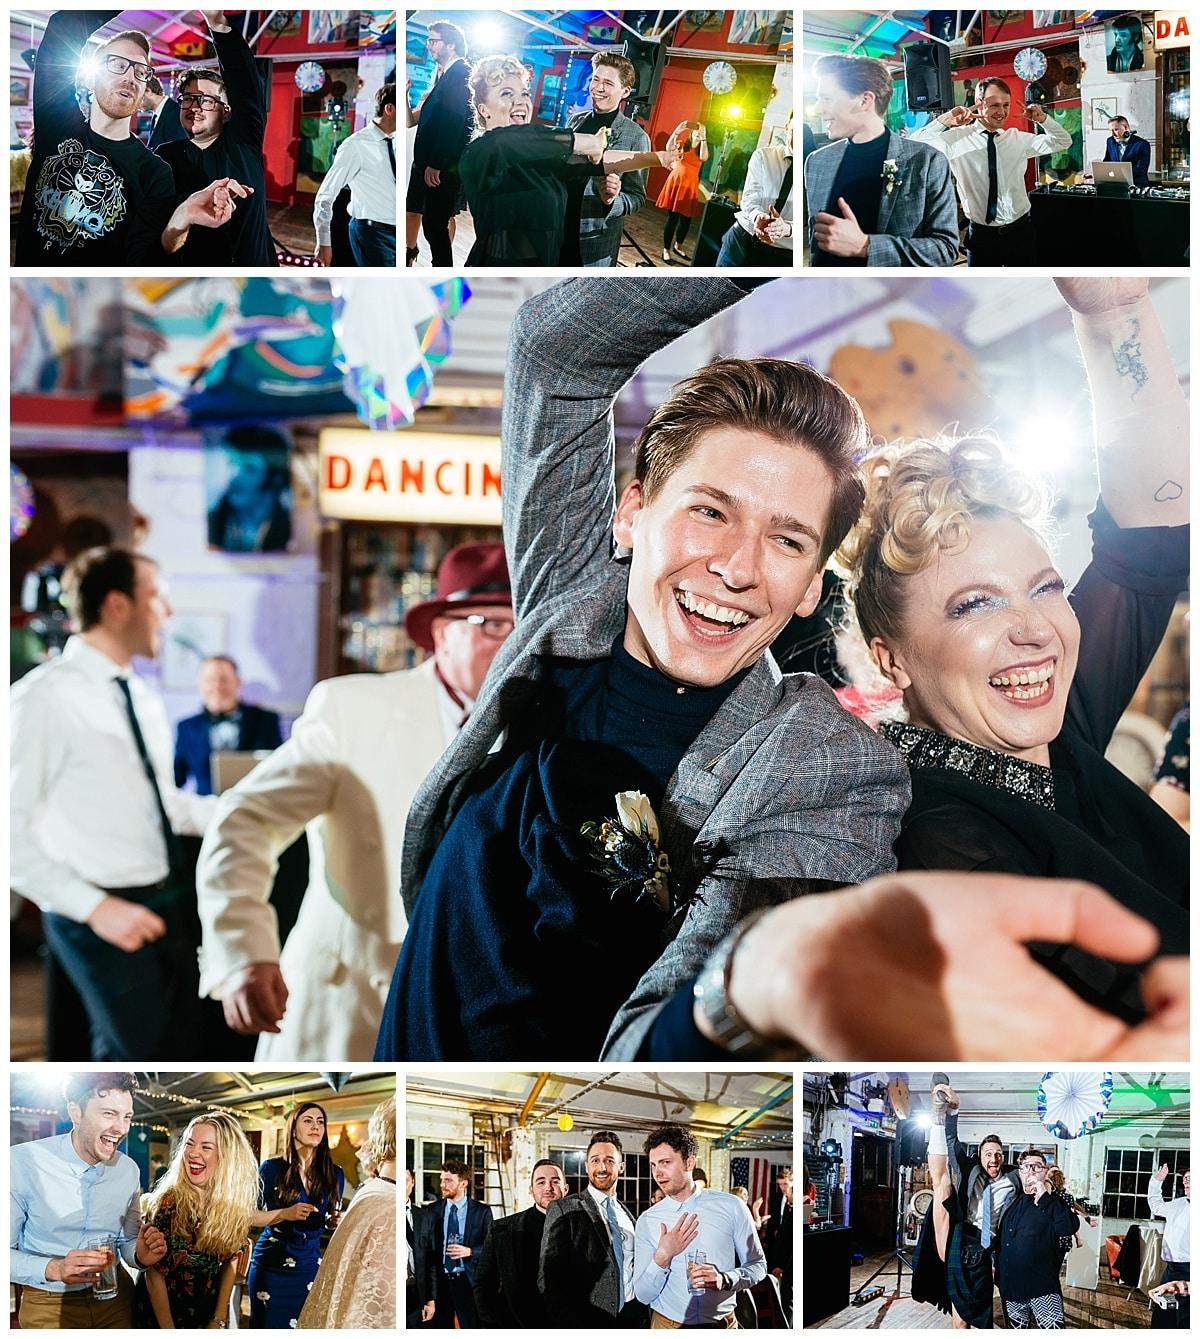 Michael James London Warehouse Hay Wedding 090-NIKON D3 35 mm 1-125 sec at f - 4.0 ISO 400 04 Mar 1958 (529)__Alternative Wedding Photographers London Gay Samesex Colourful.jpg